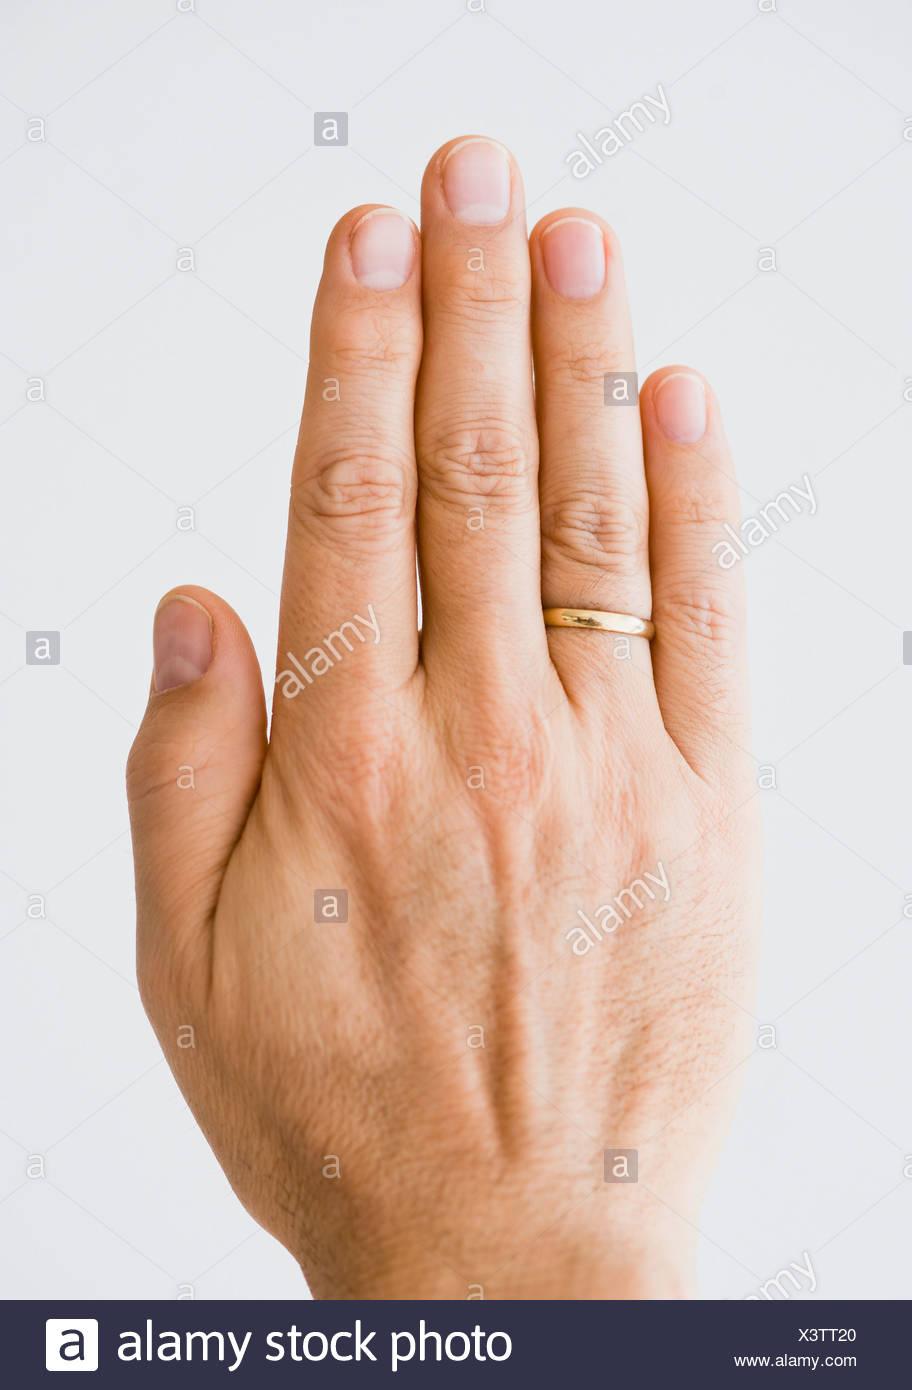 Close up of man's hand wearing wedding ring - Stock Image